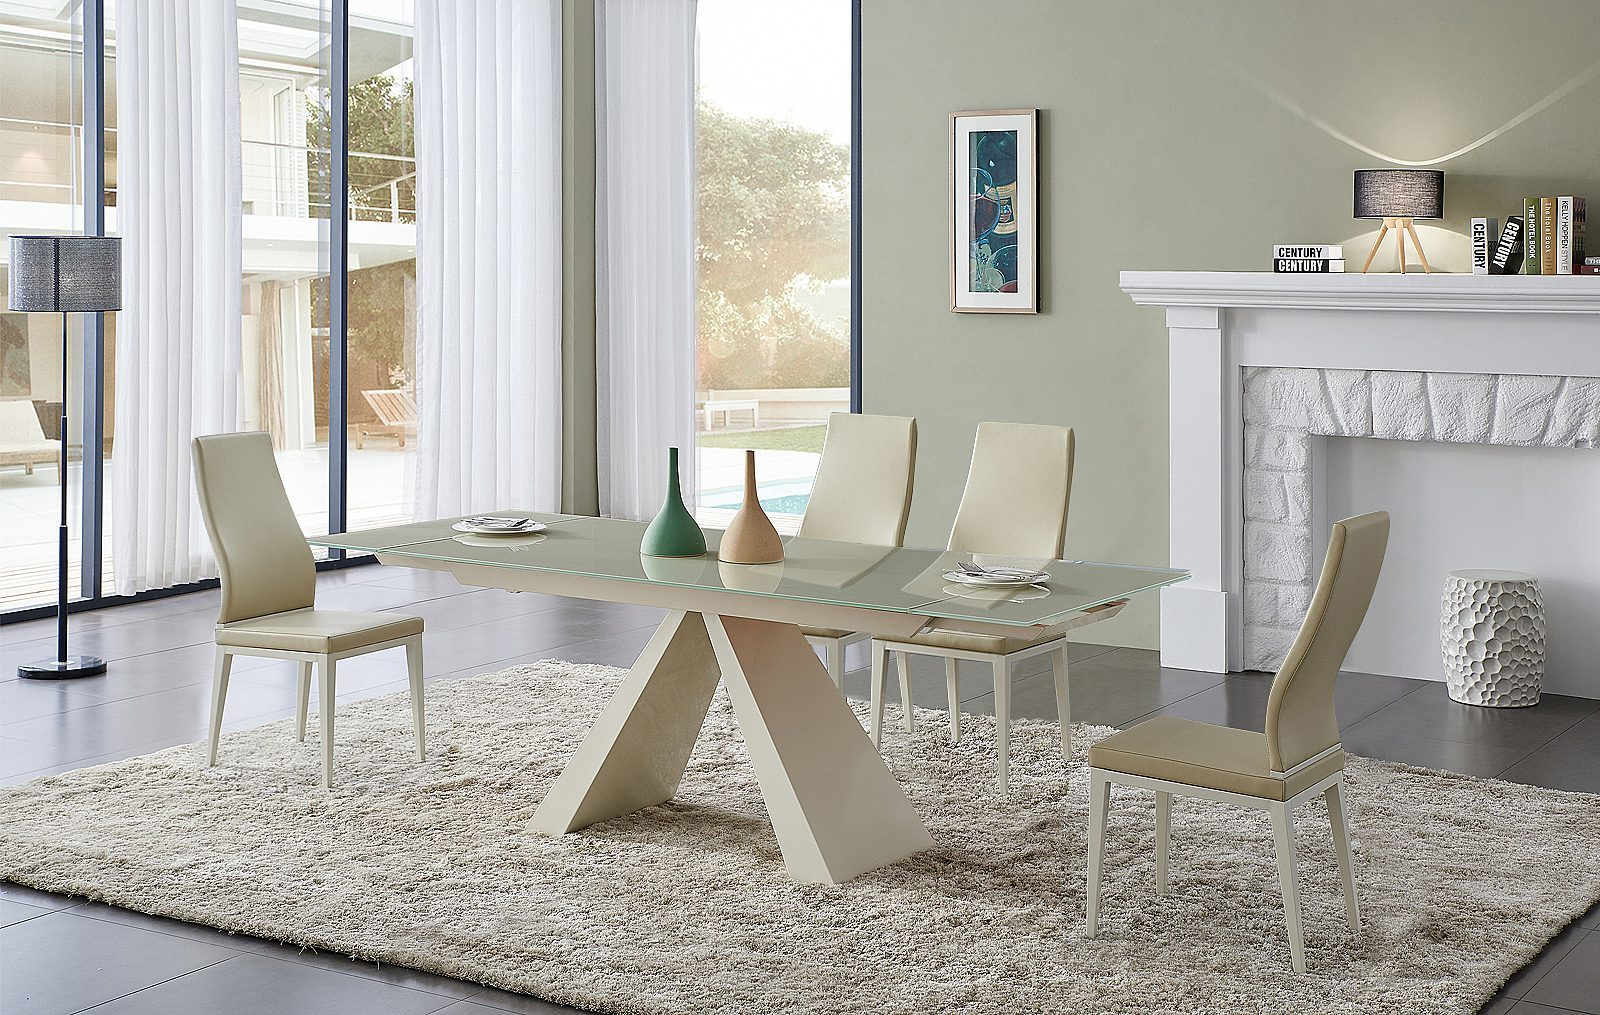 Стол ESF CT2086 бежевый и стулья CY6120 бежевые